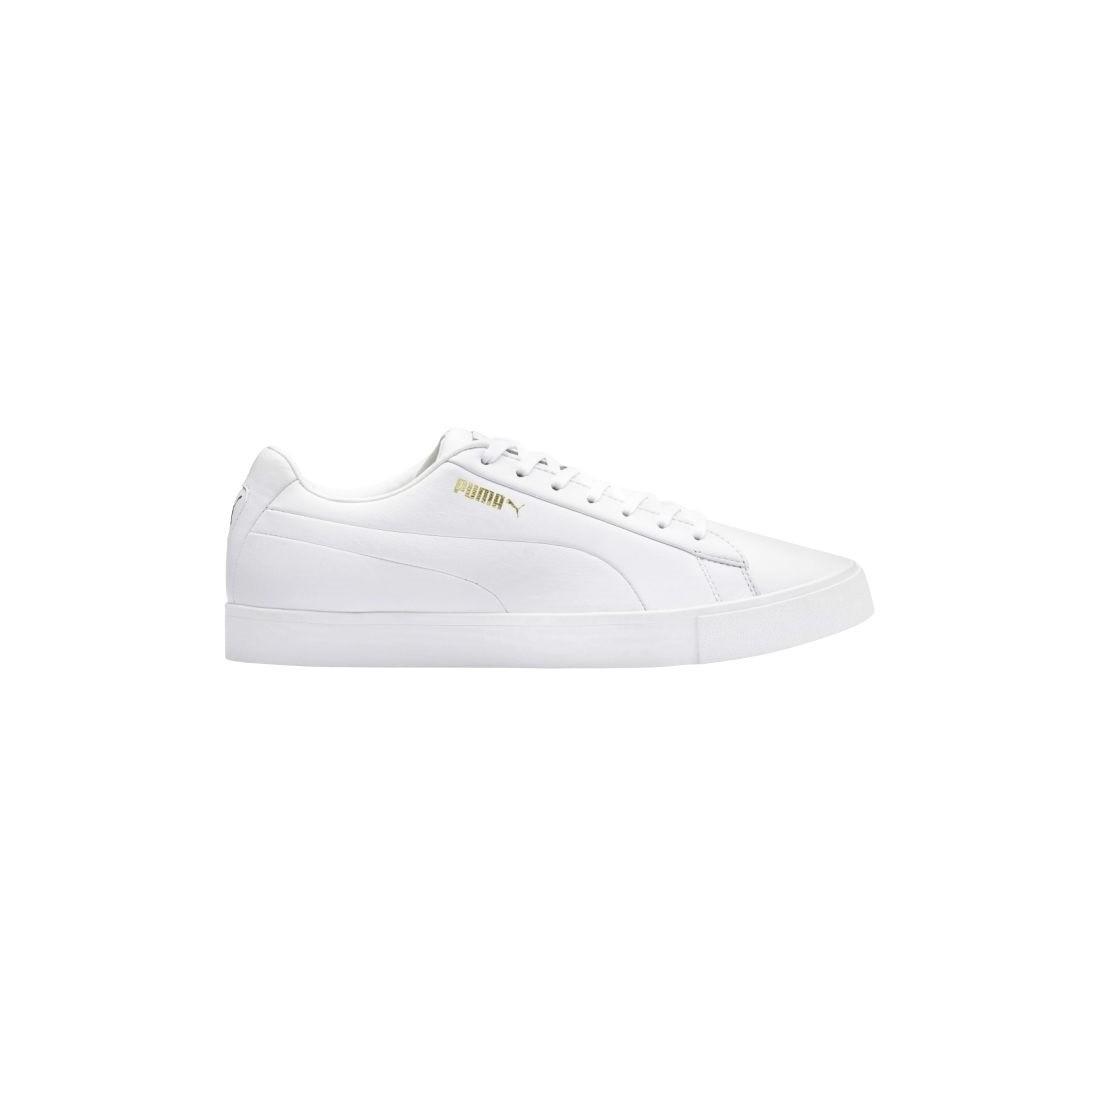 puma chaussures femme blanche